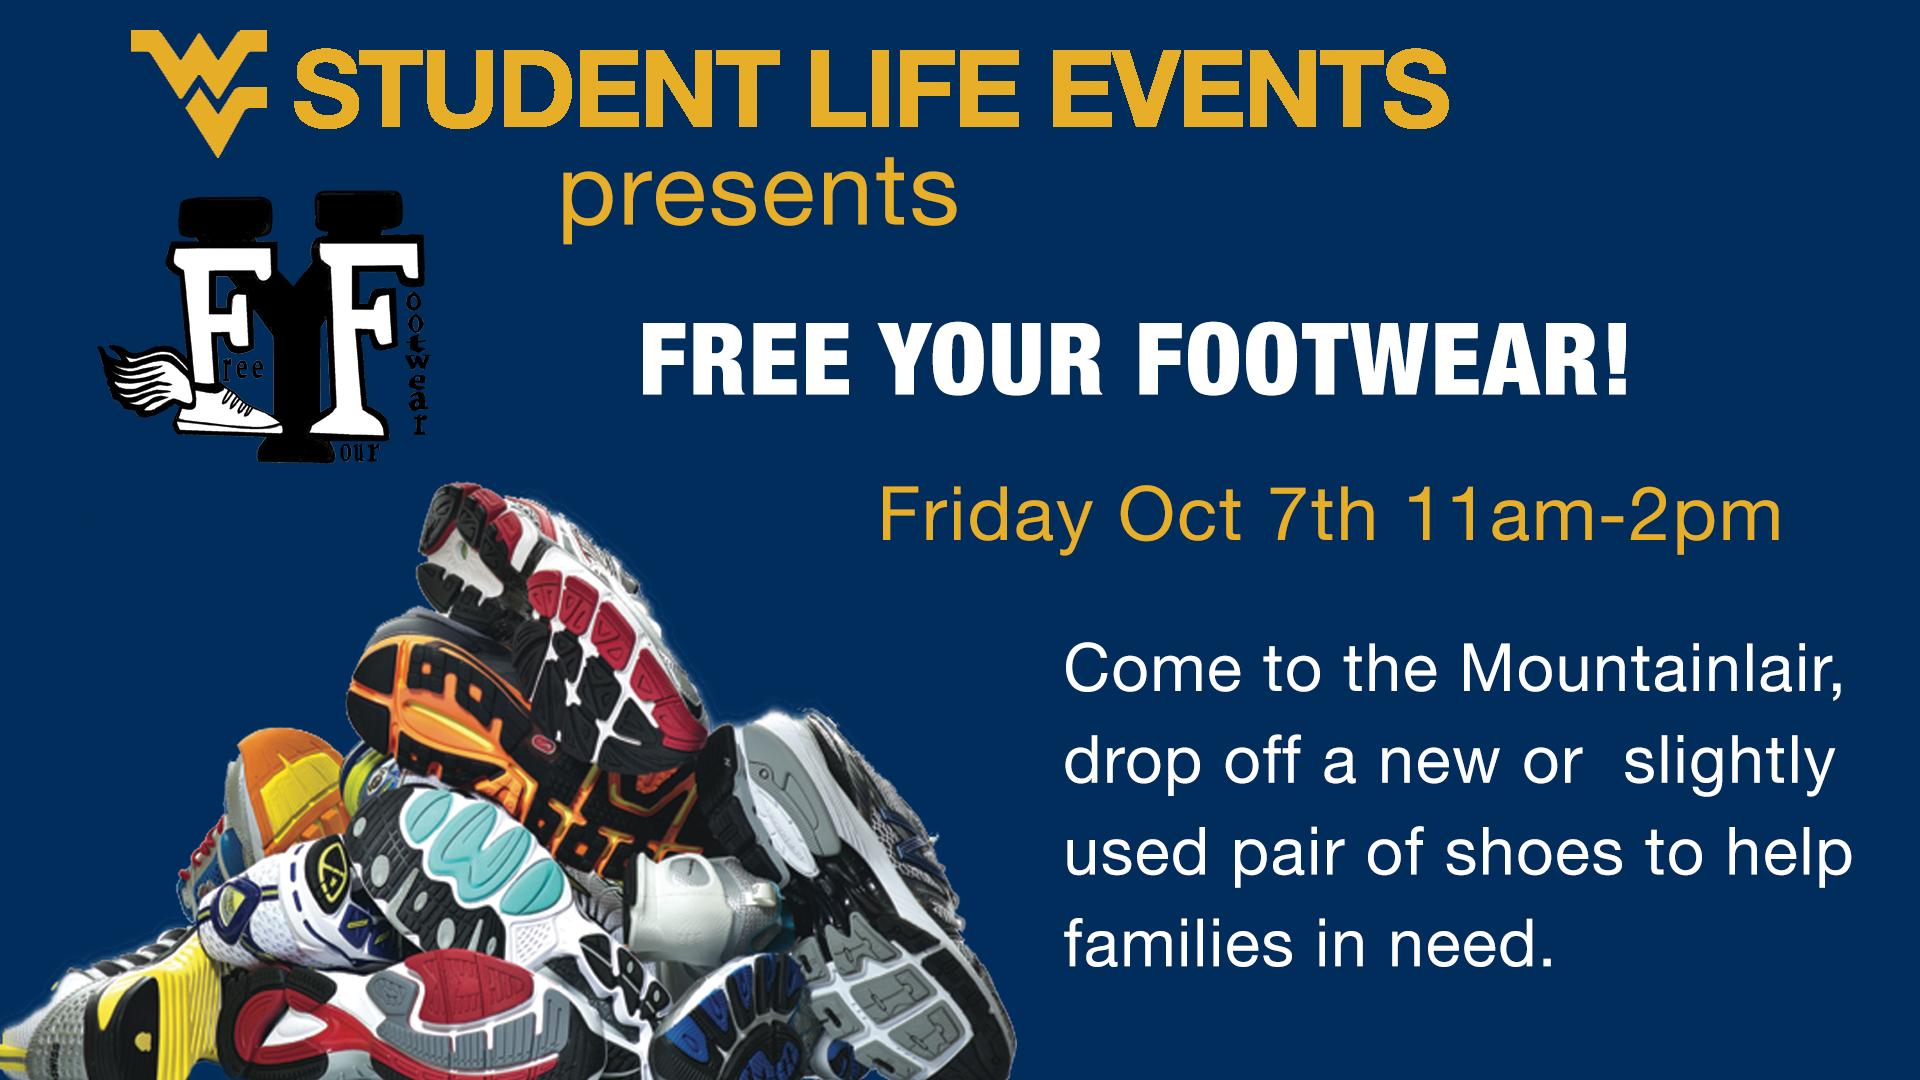 Student Life EventsSignage